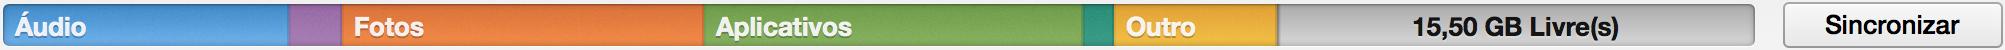 Barra de armazenamento de iGadgets no iTunes